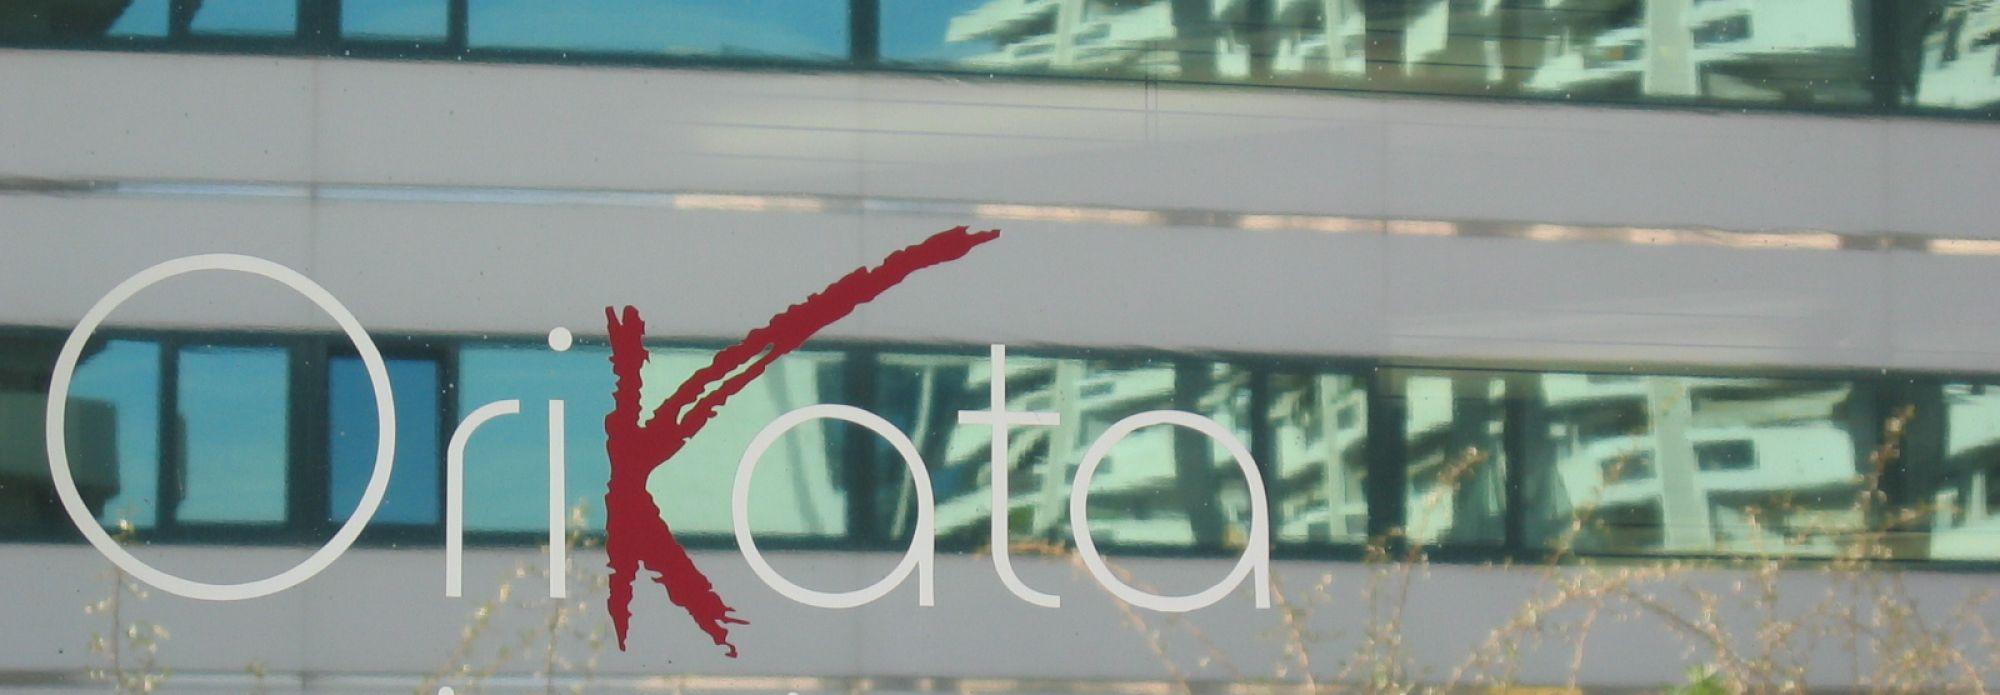 uffici orikata 001